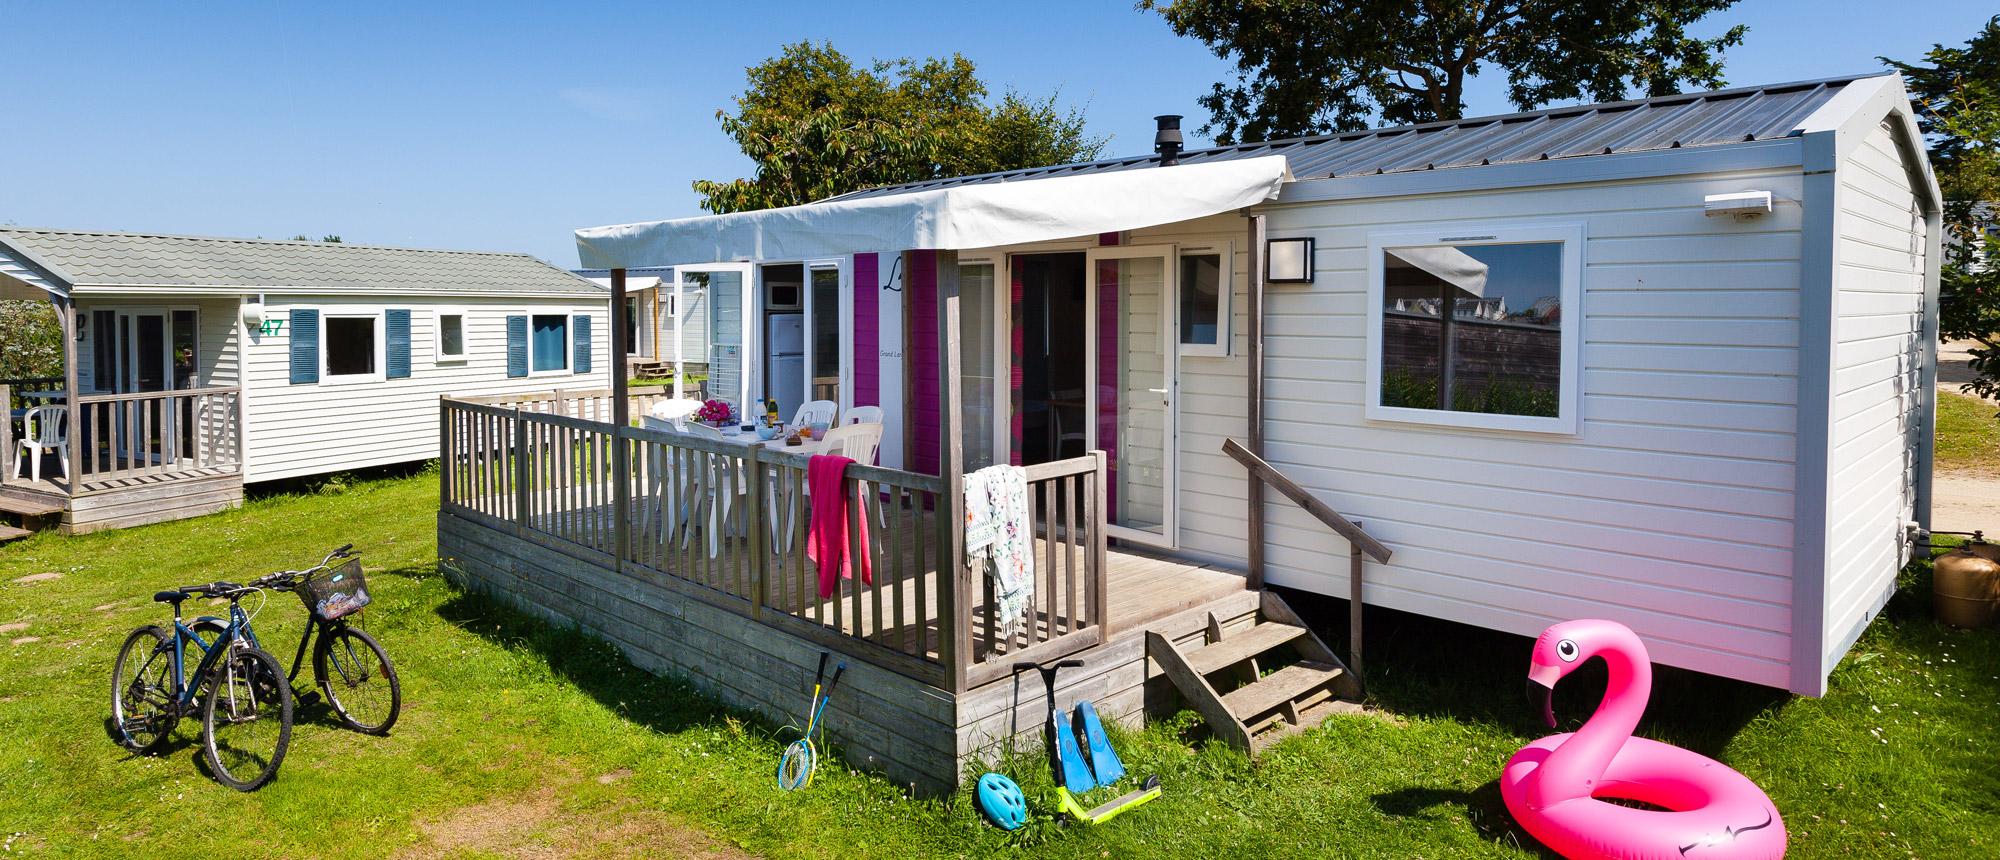 Location mobile-home camping Ar Kleguer